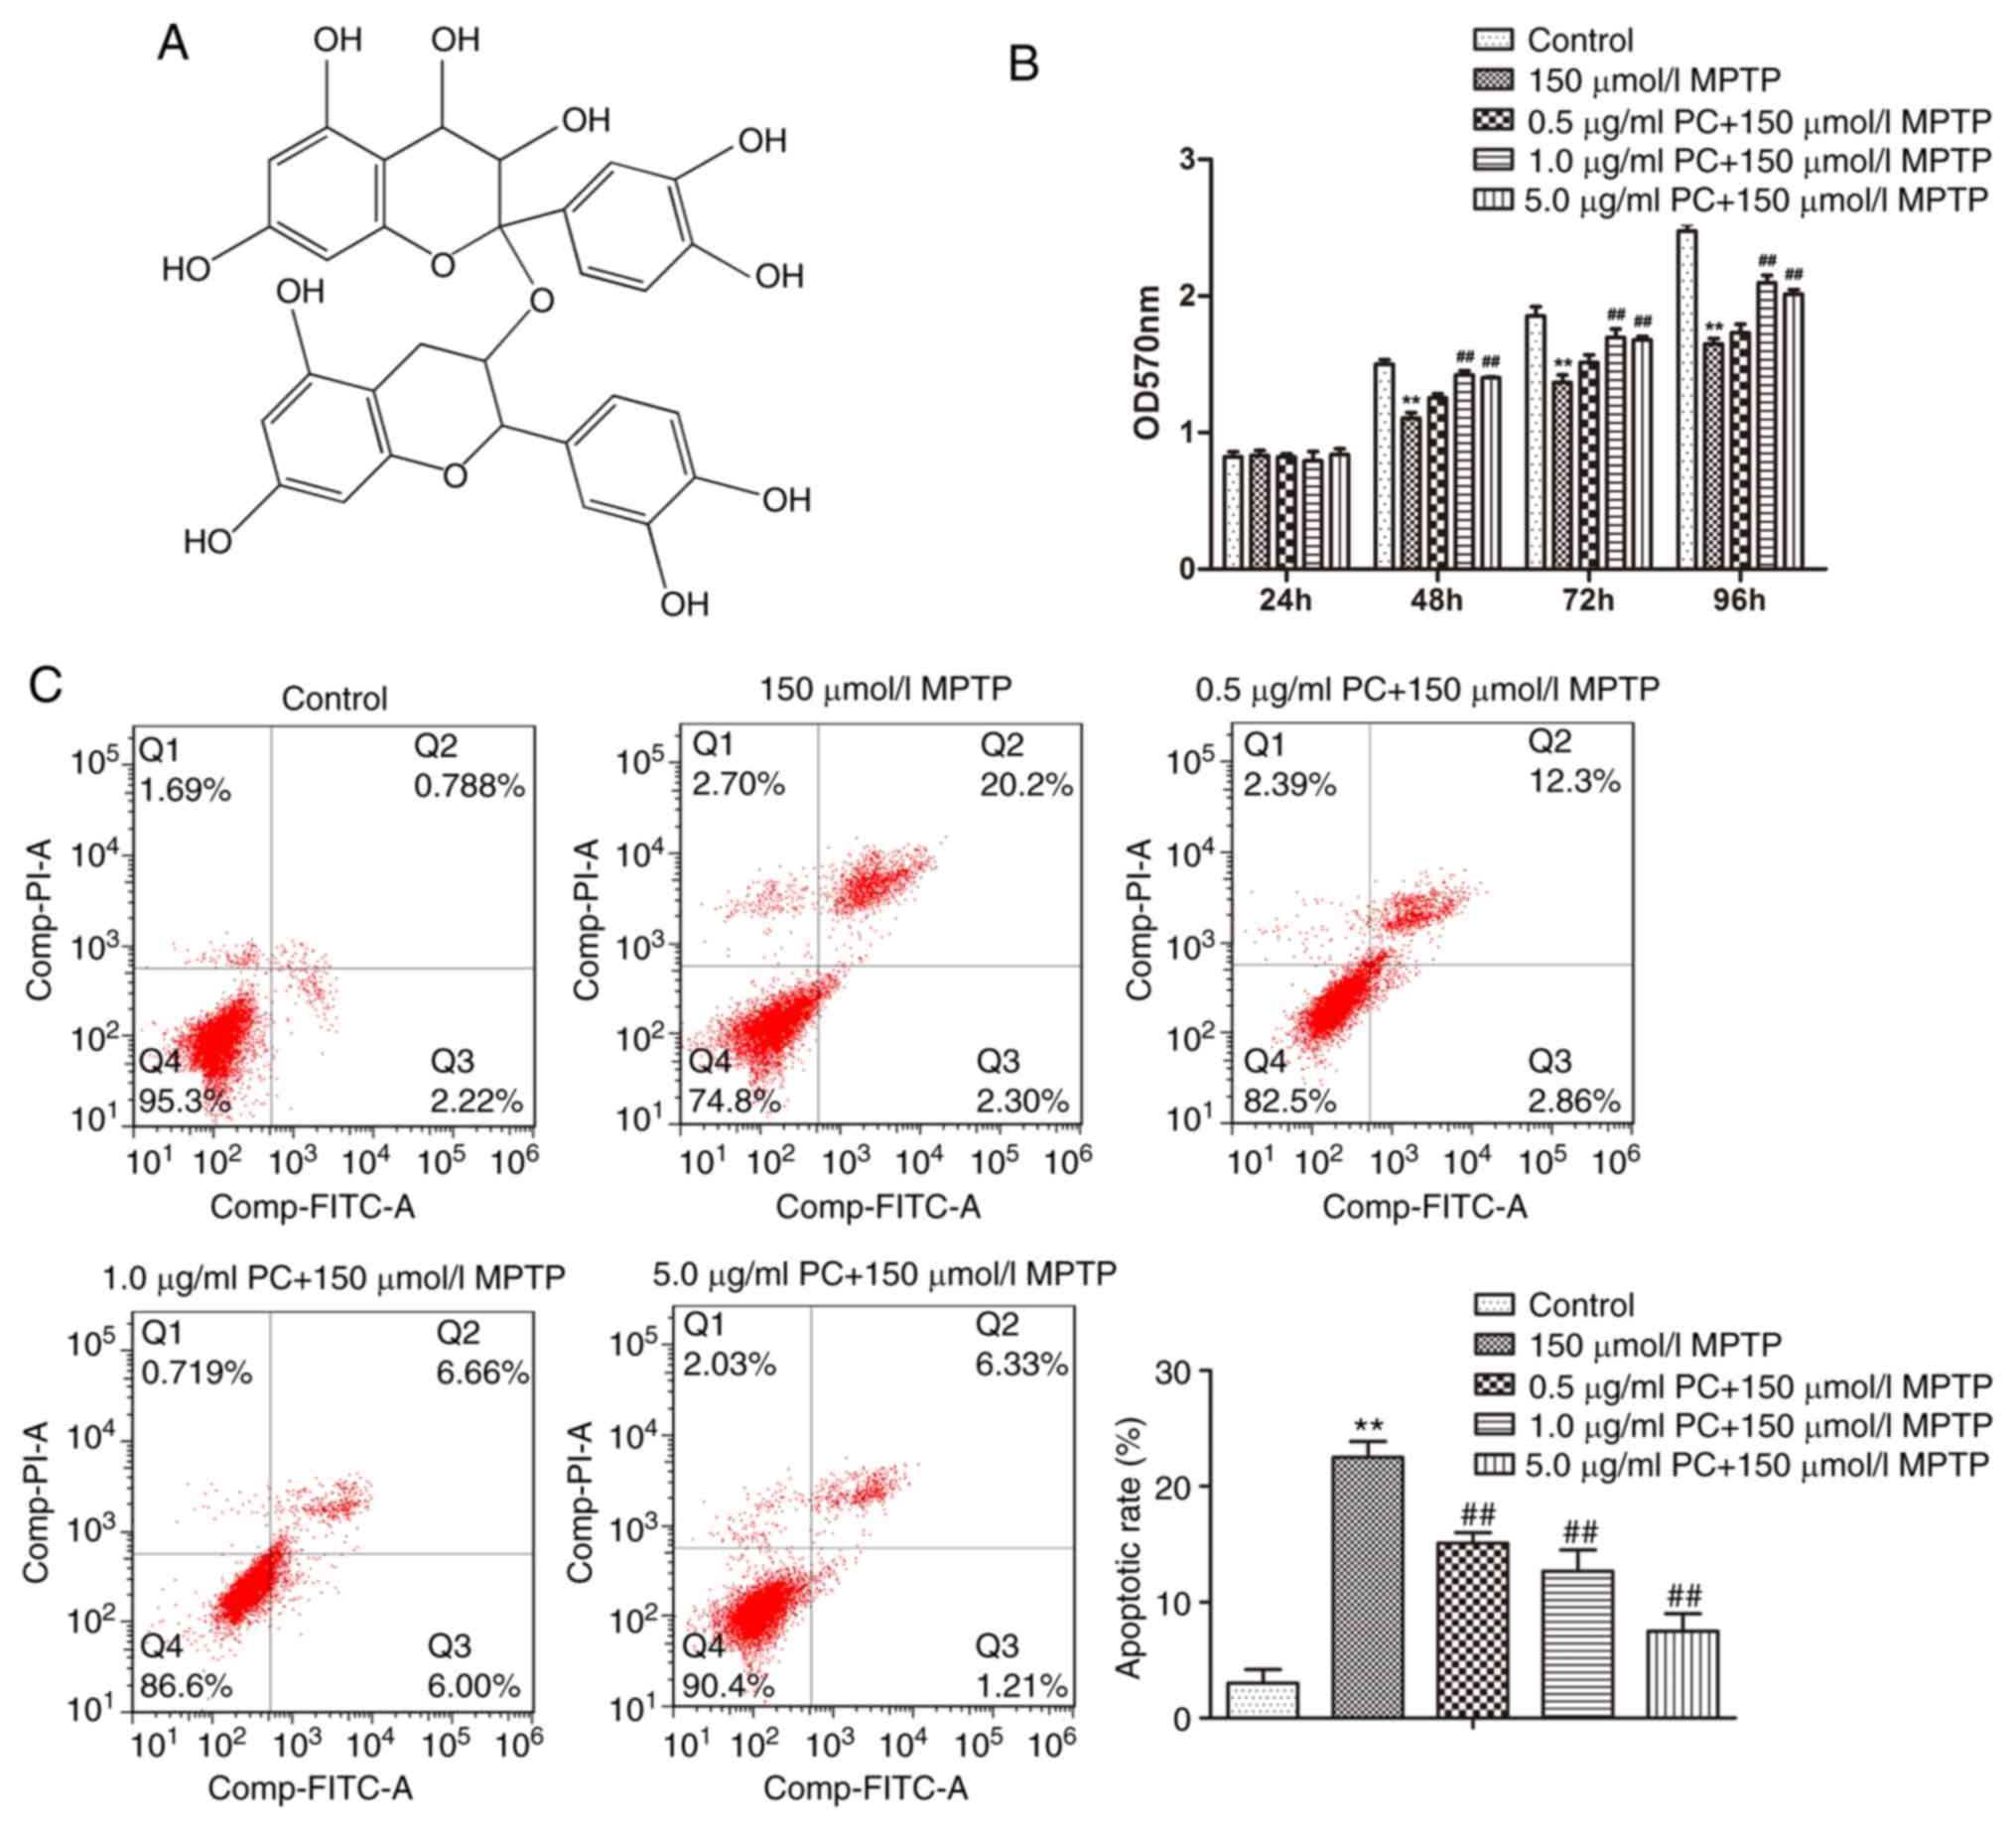 Proanthocyanidins exert a neuroprotective effect via ROS/JNK